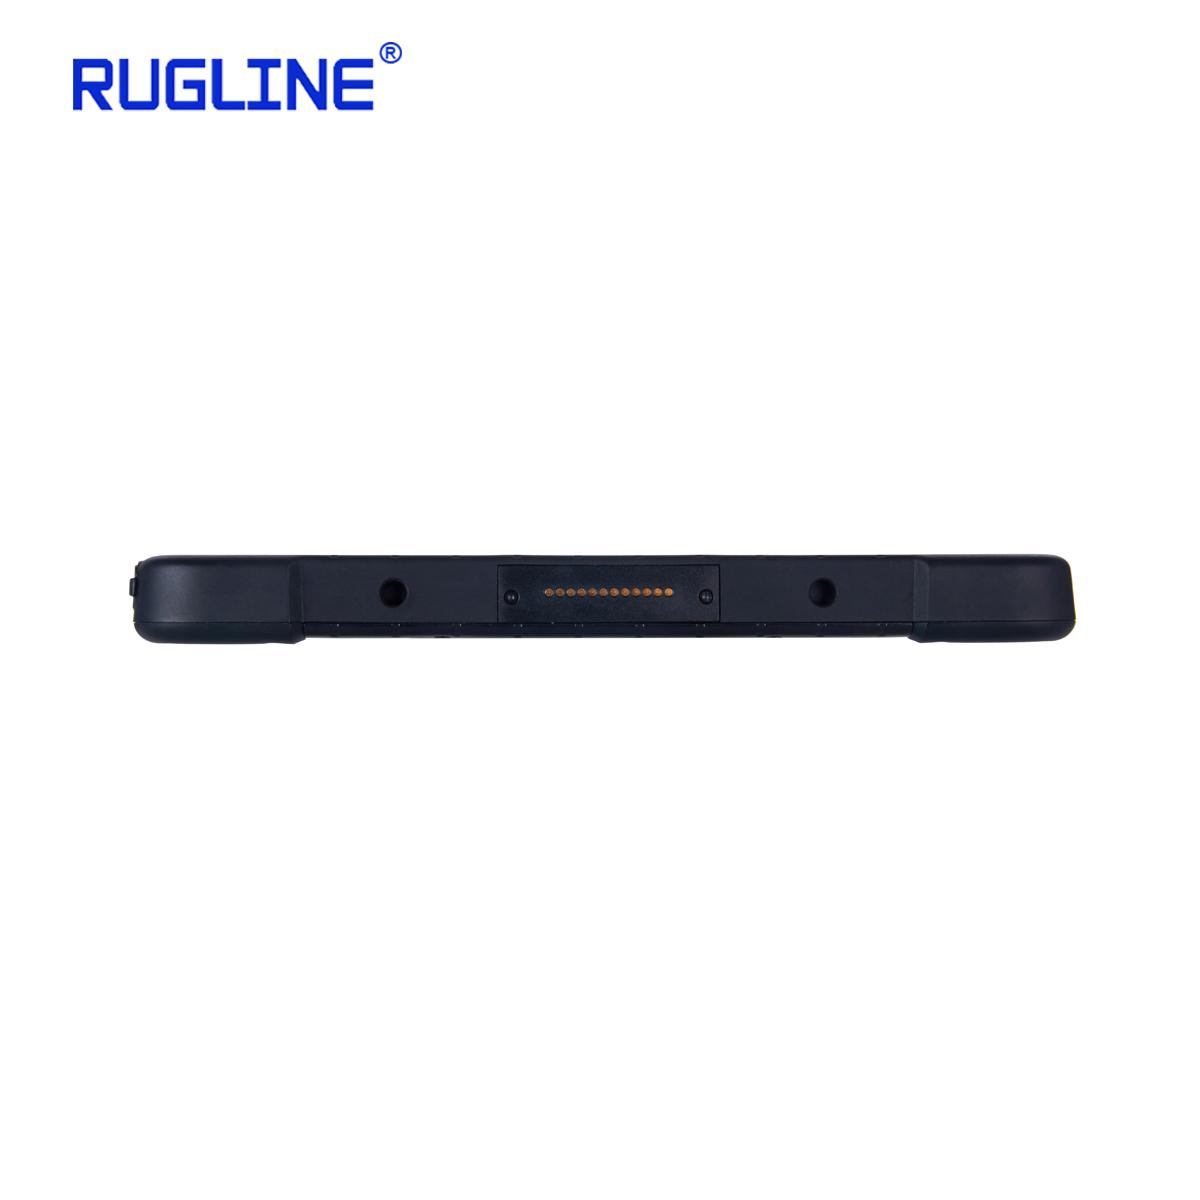 rugged windows tablet (5)